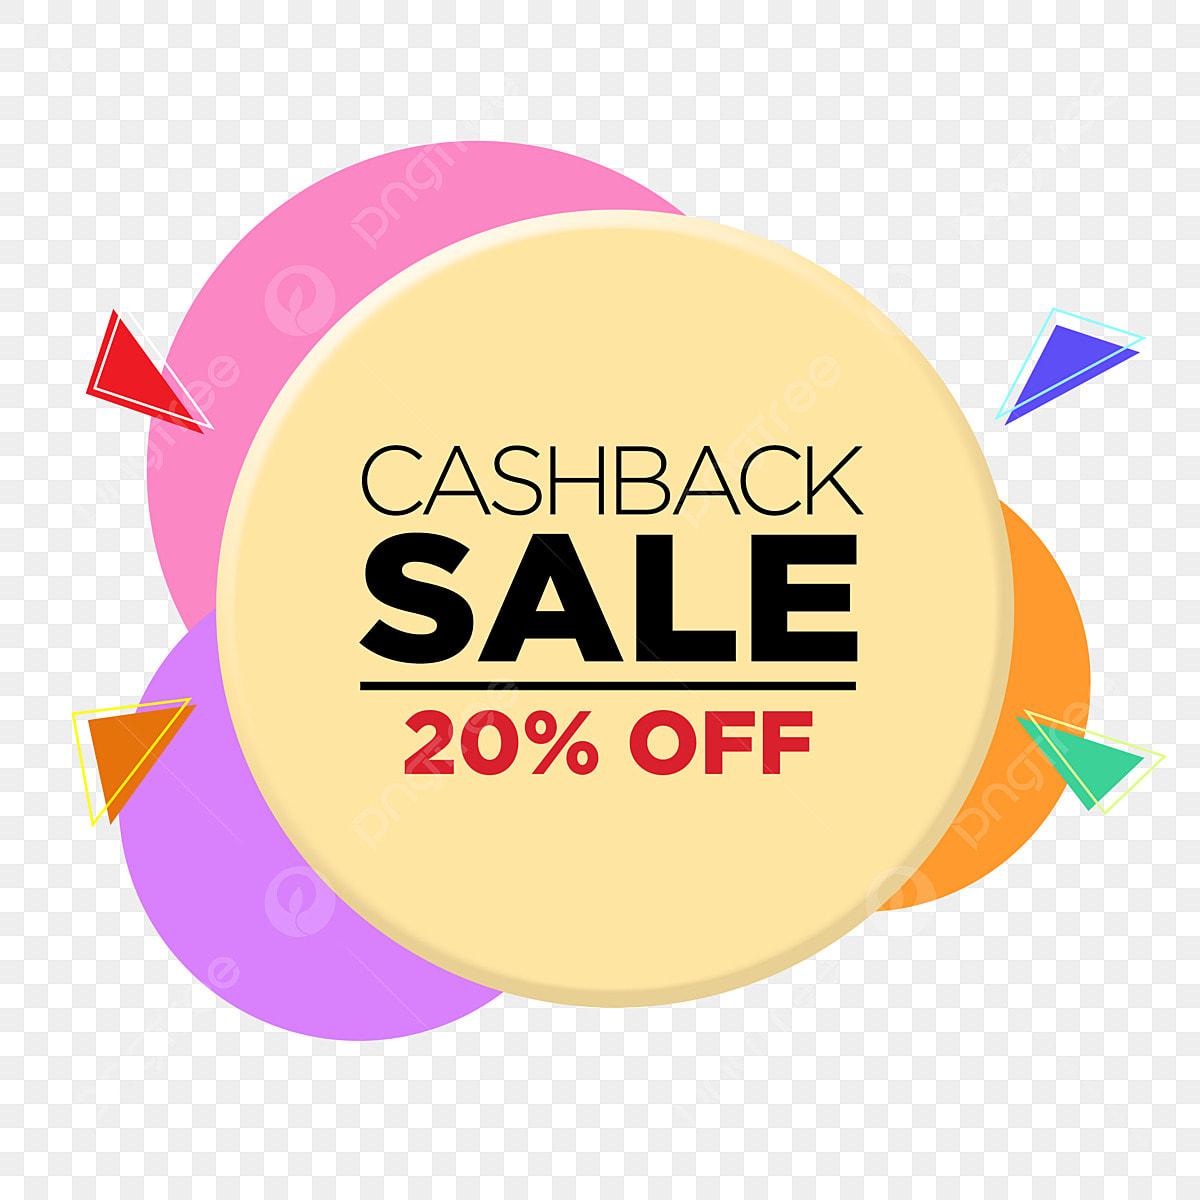 cashback png images vector and psd files free download on pngtree https pngtree com freepng cashback sale 50 off tagging 5309232 html